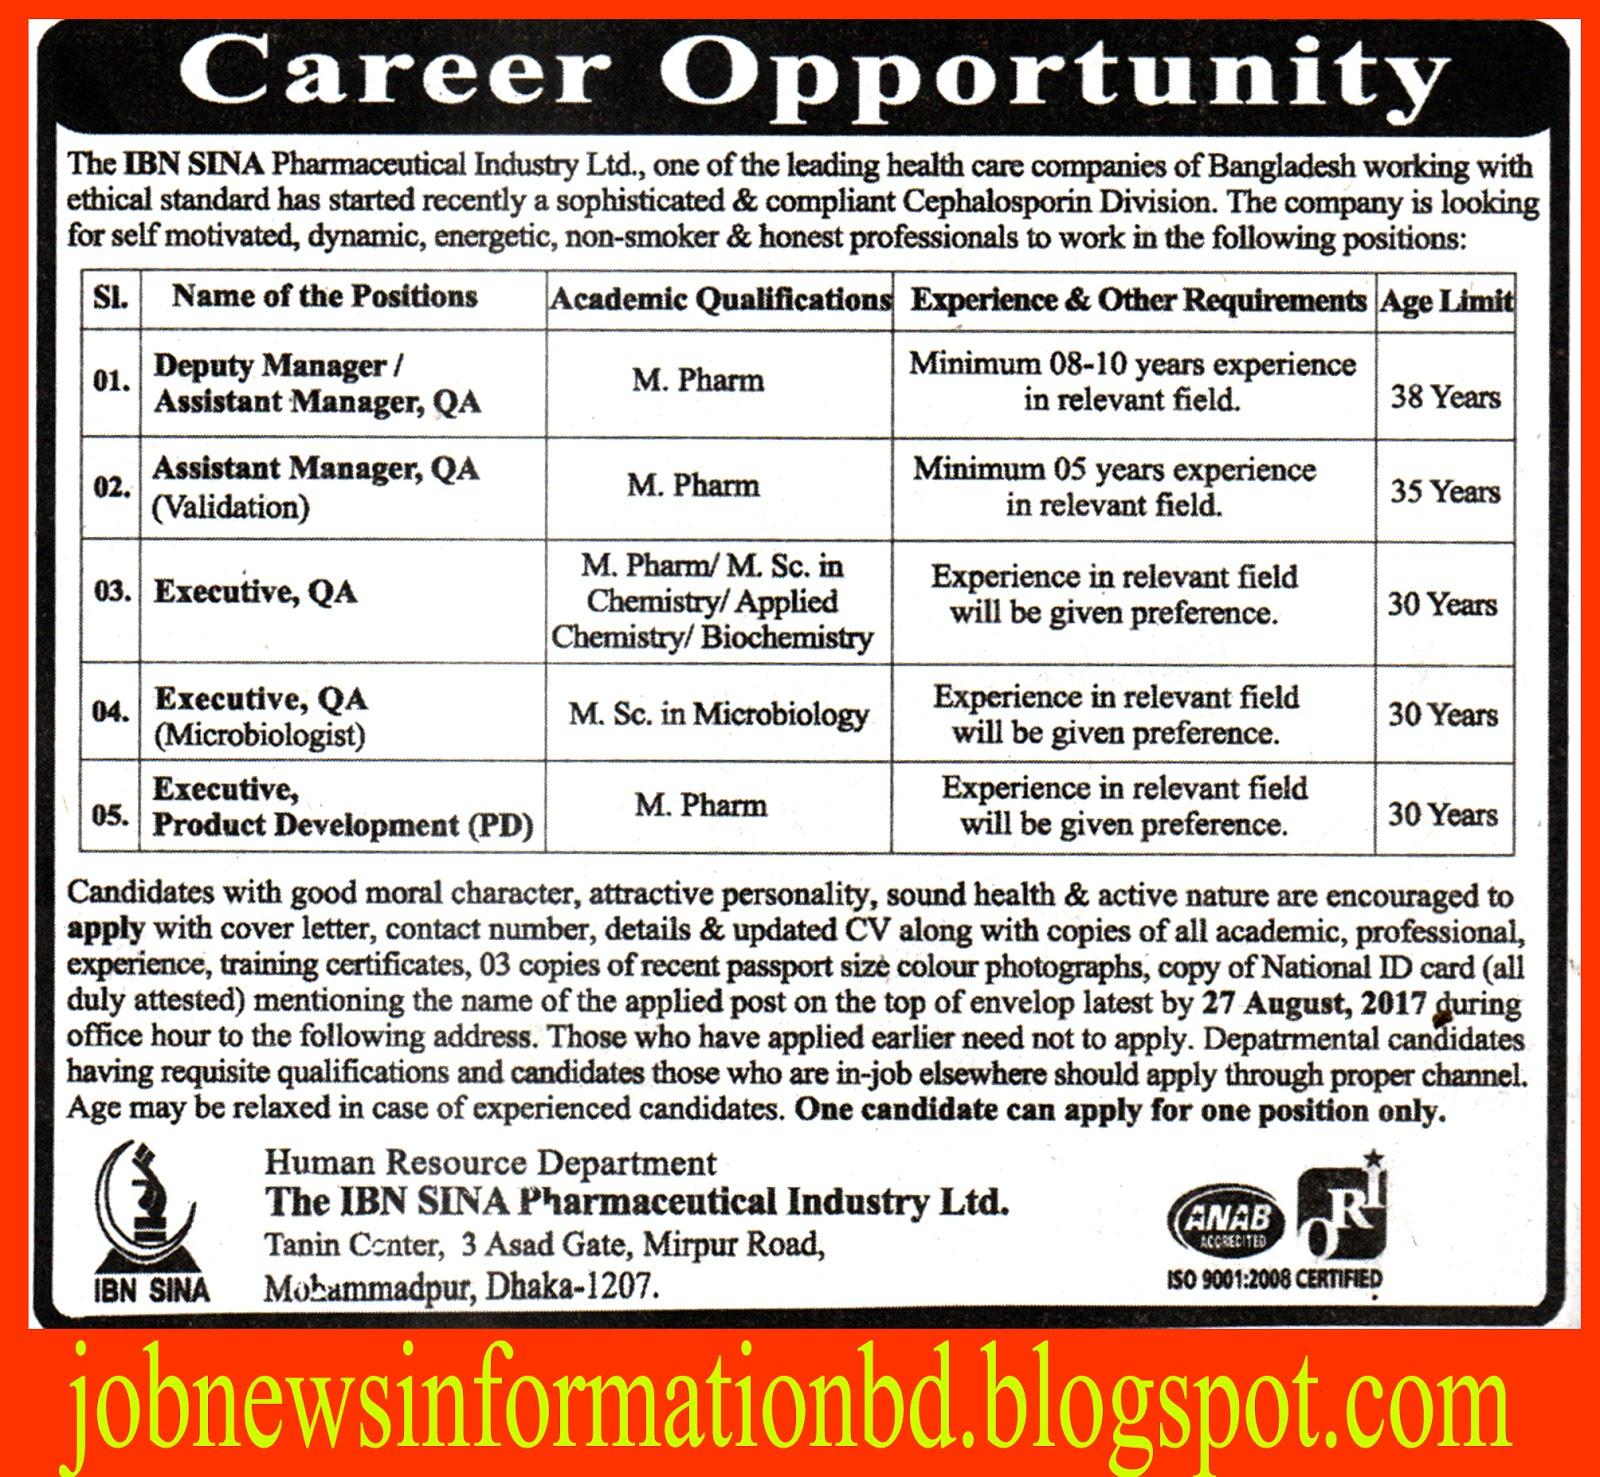 IBN SINA Pharmaceutical Industry Ltd. Job Circular 2017